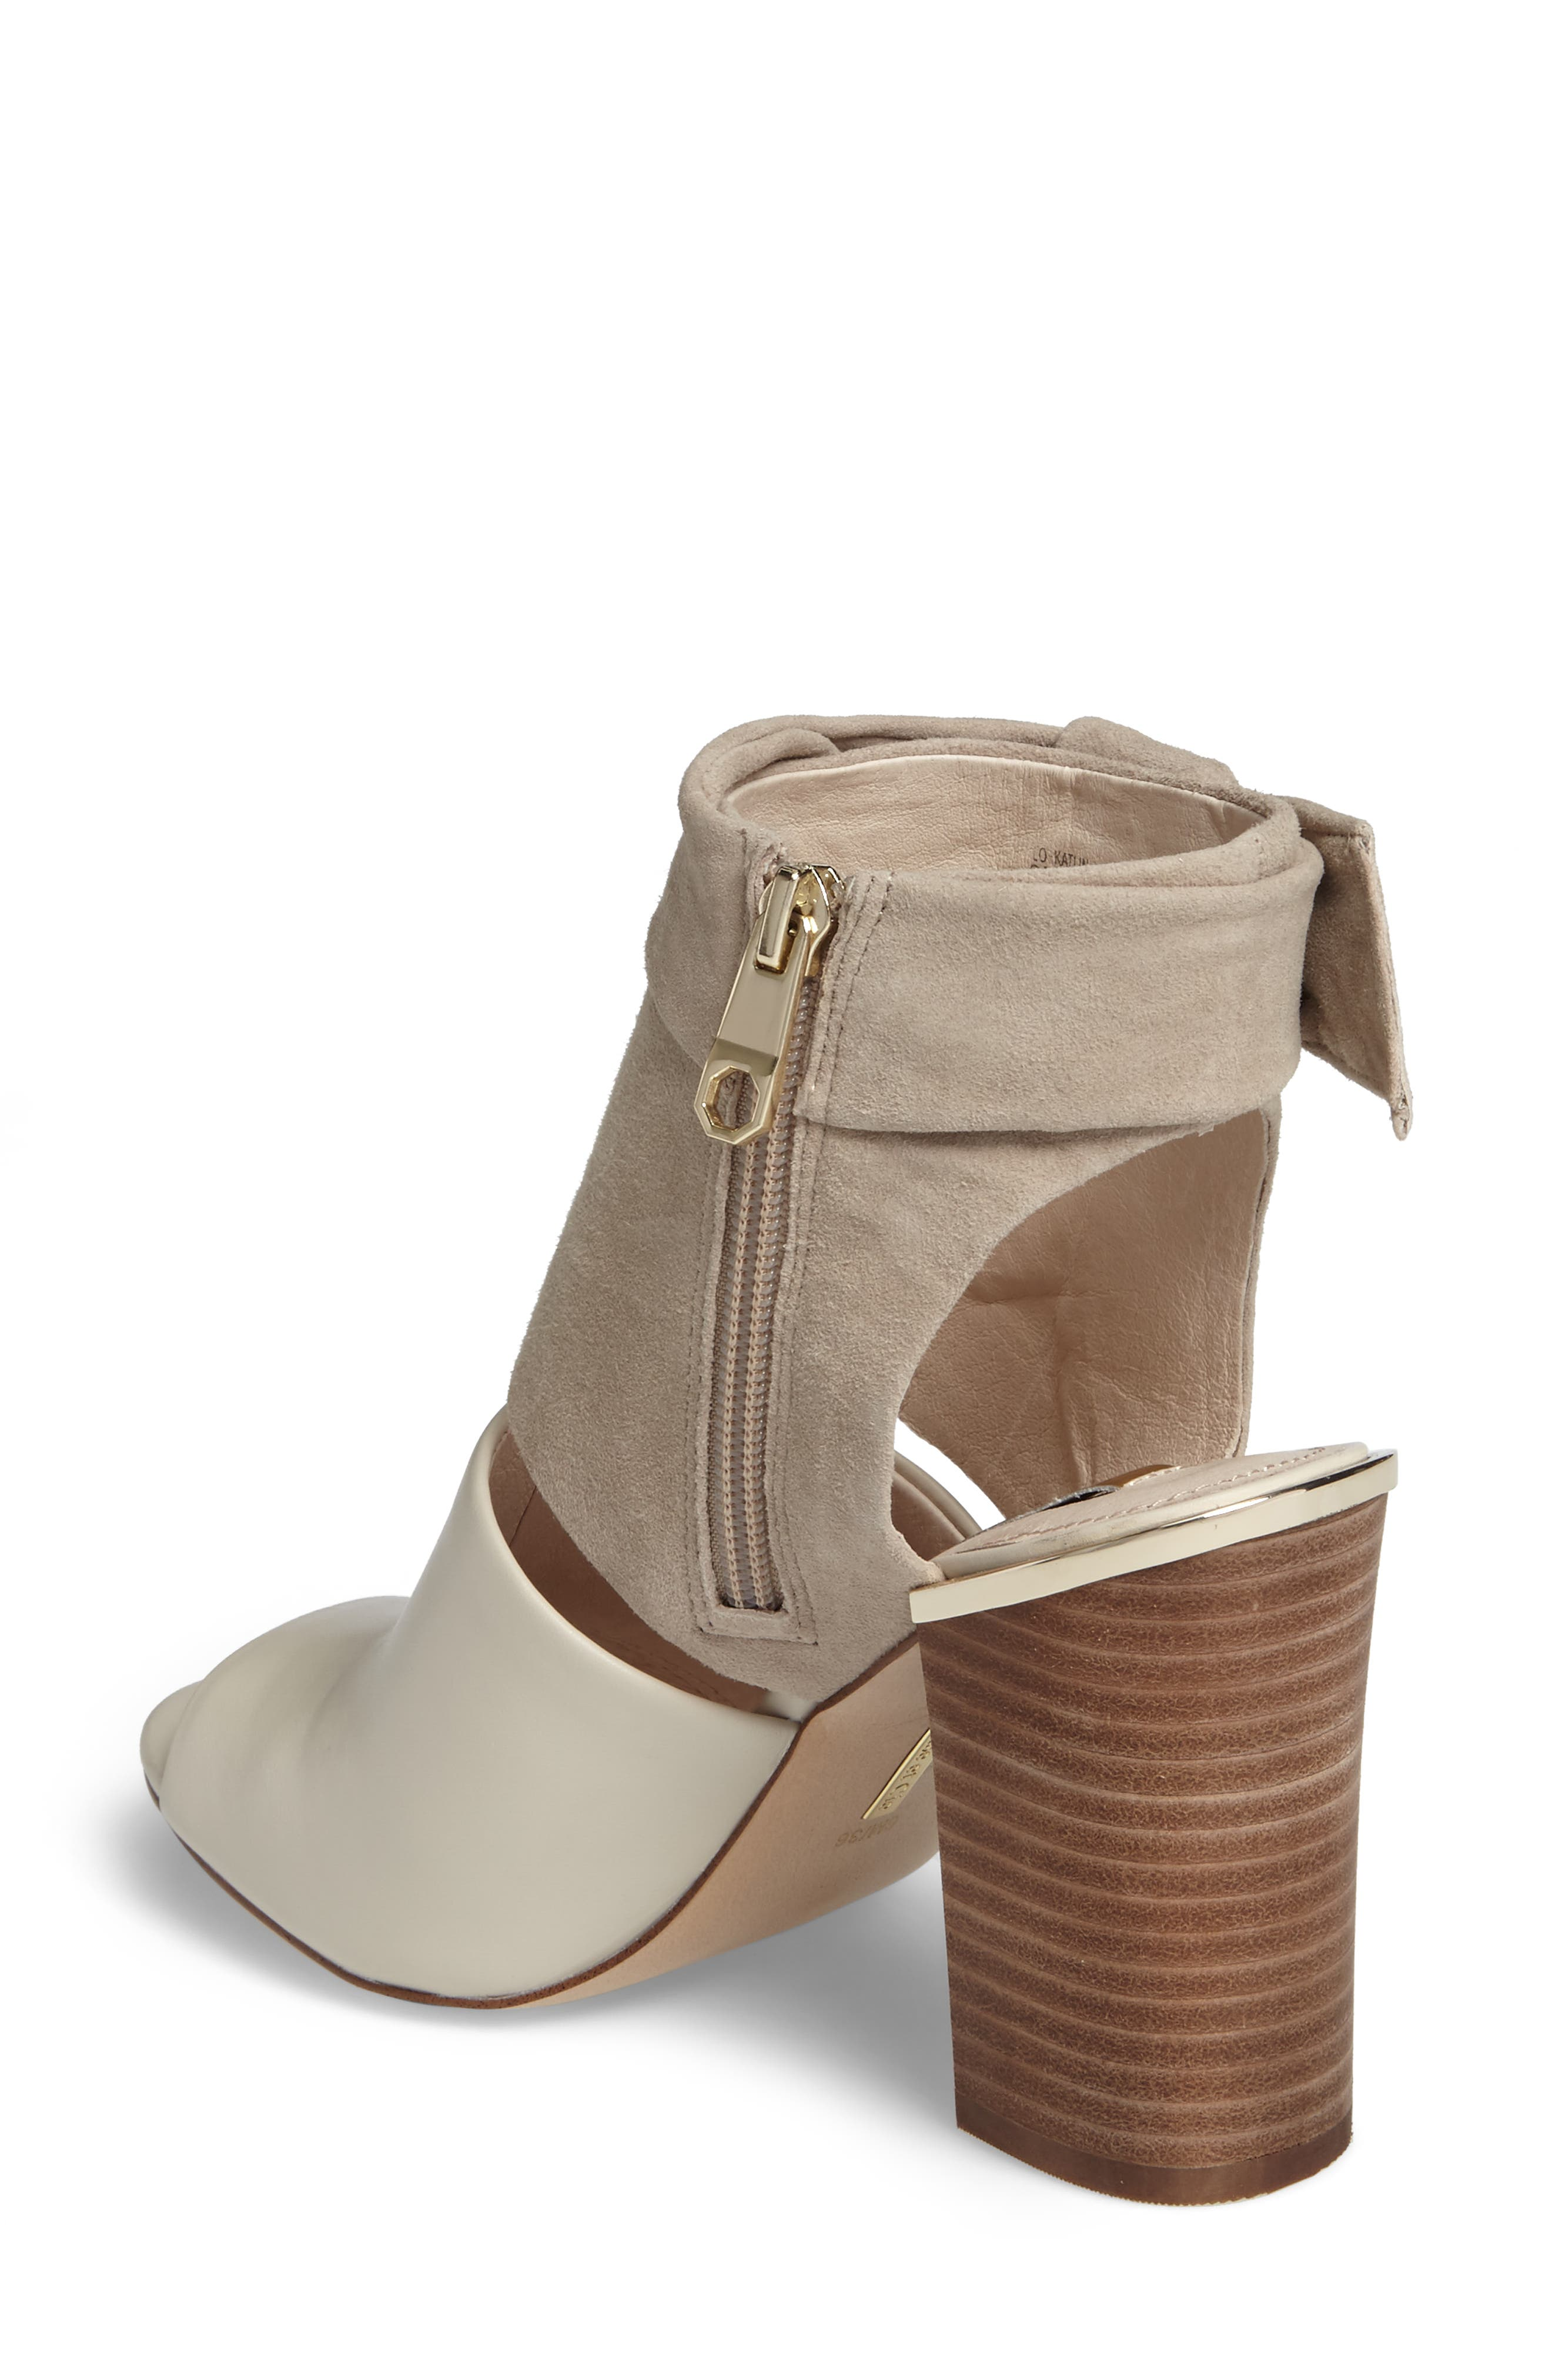 Alternate Image 2  - Louise et Cit Katlin Block Heel Sandal (Women)